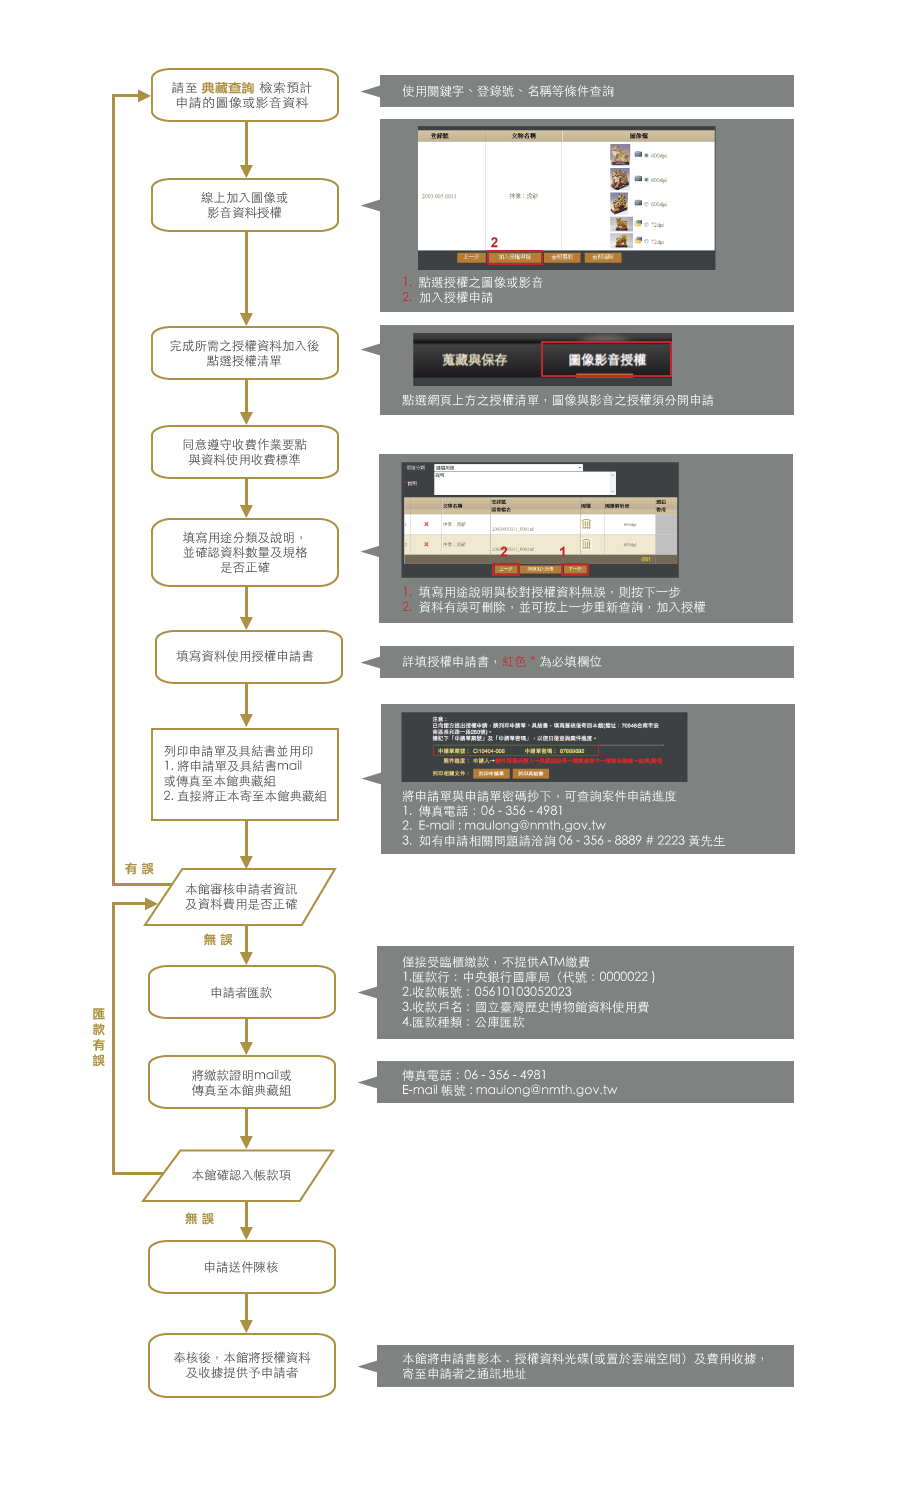 申請流程步驟說明